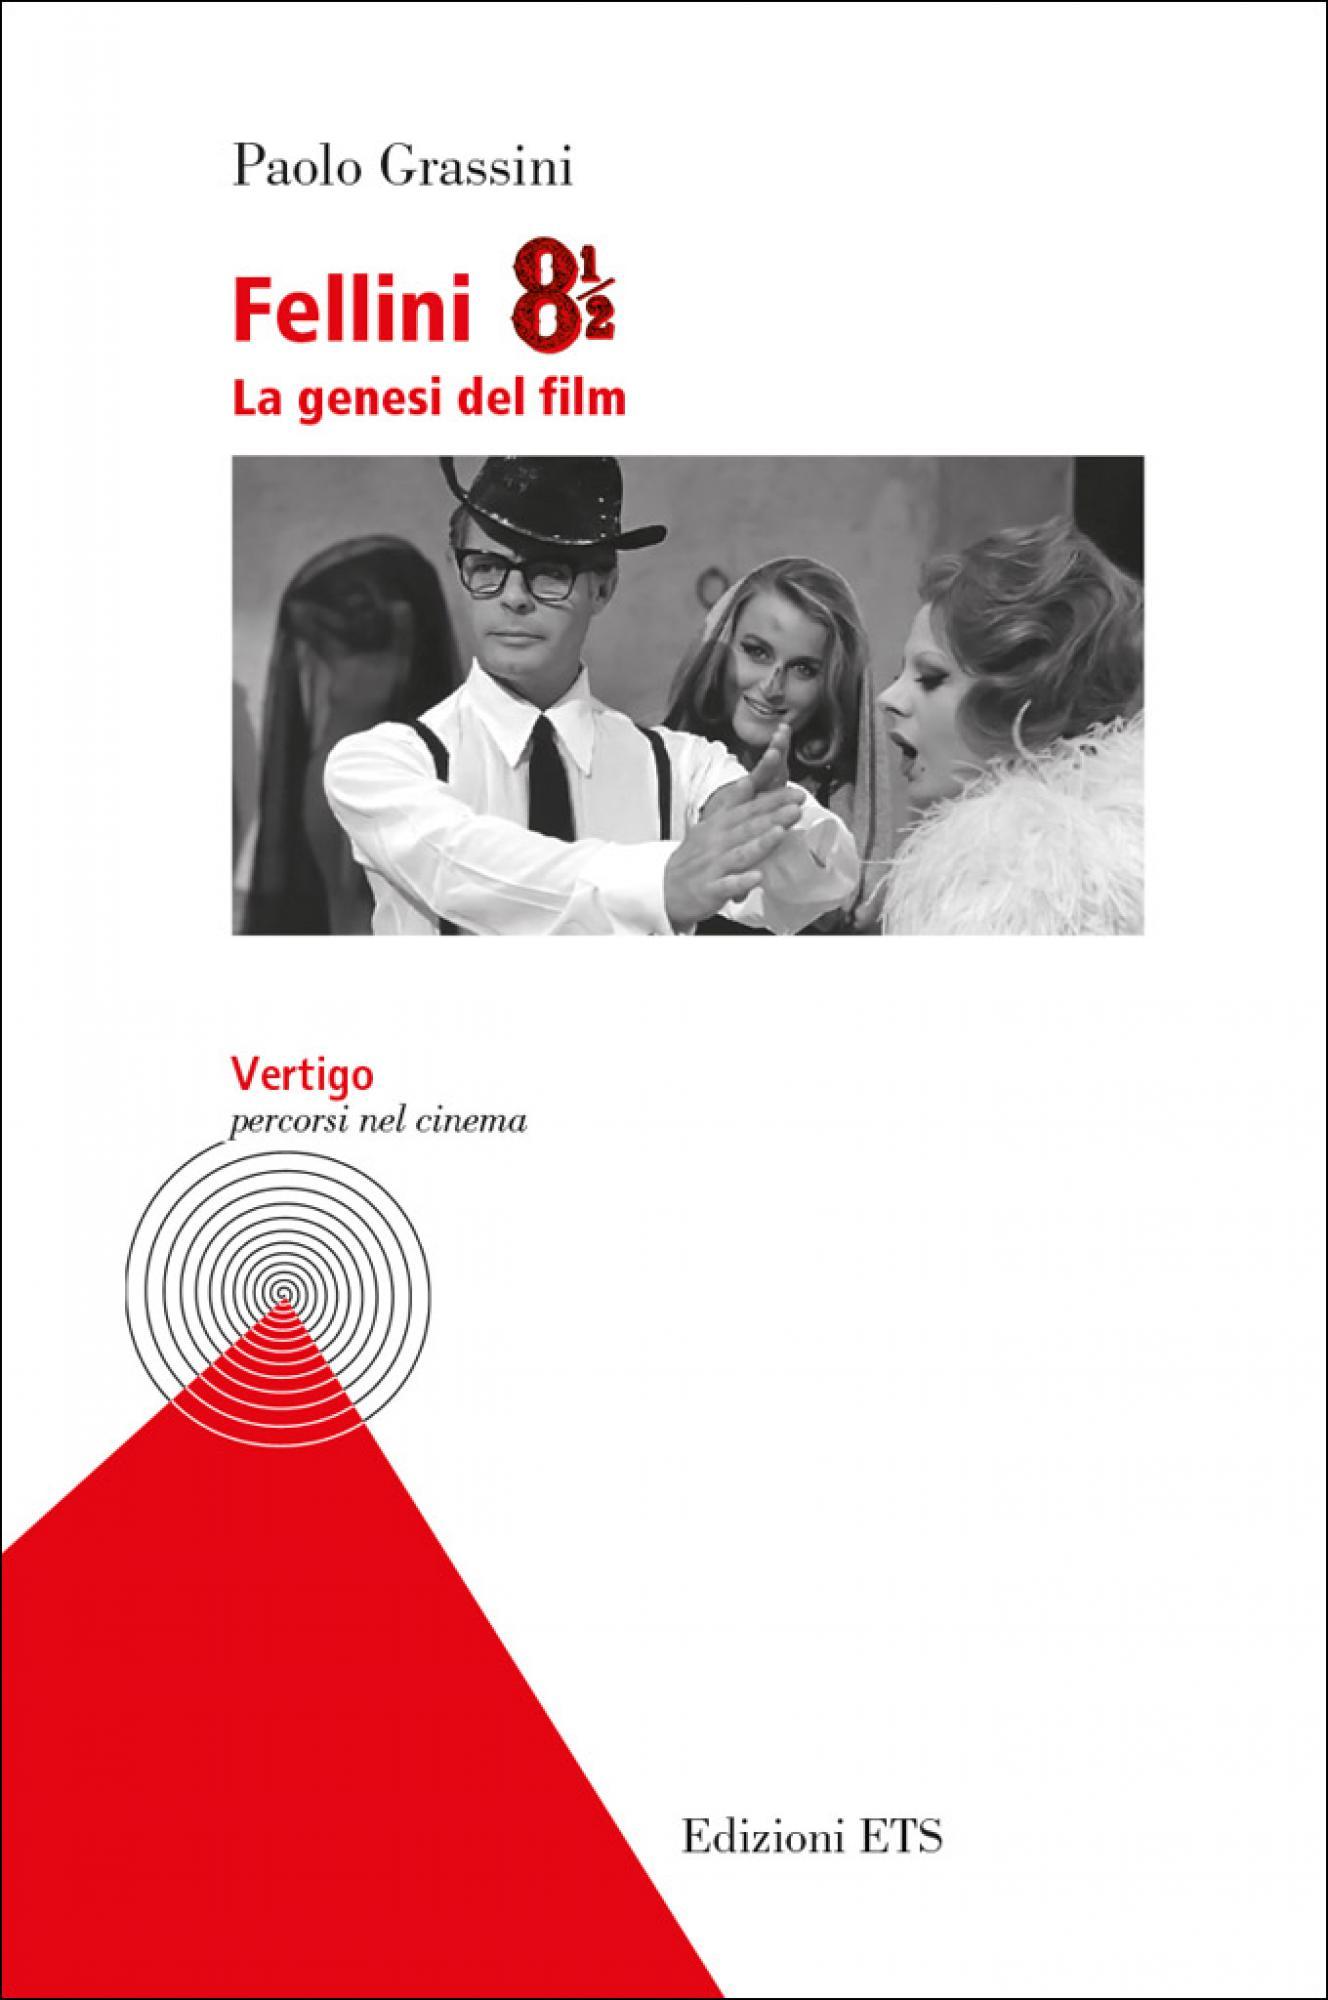 Fellini 8 1/2.La genesi del film